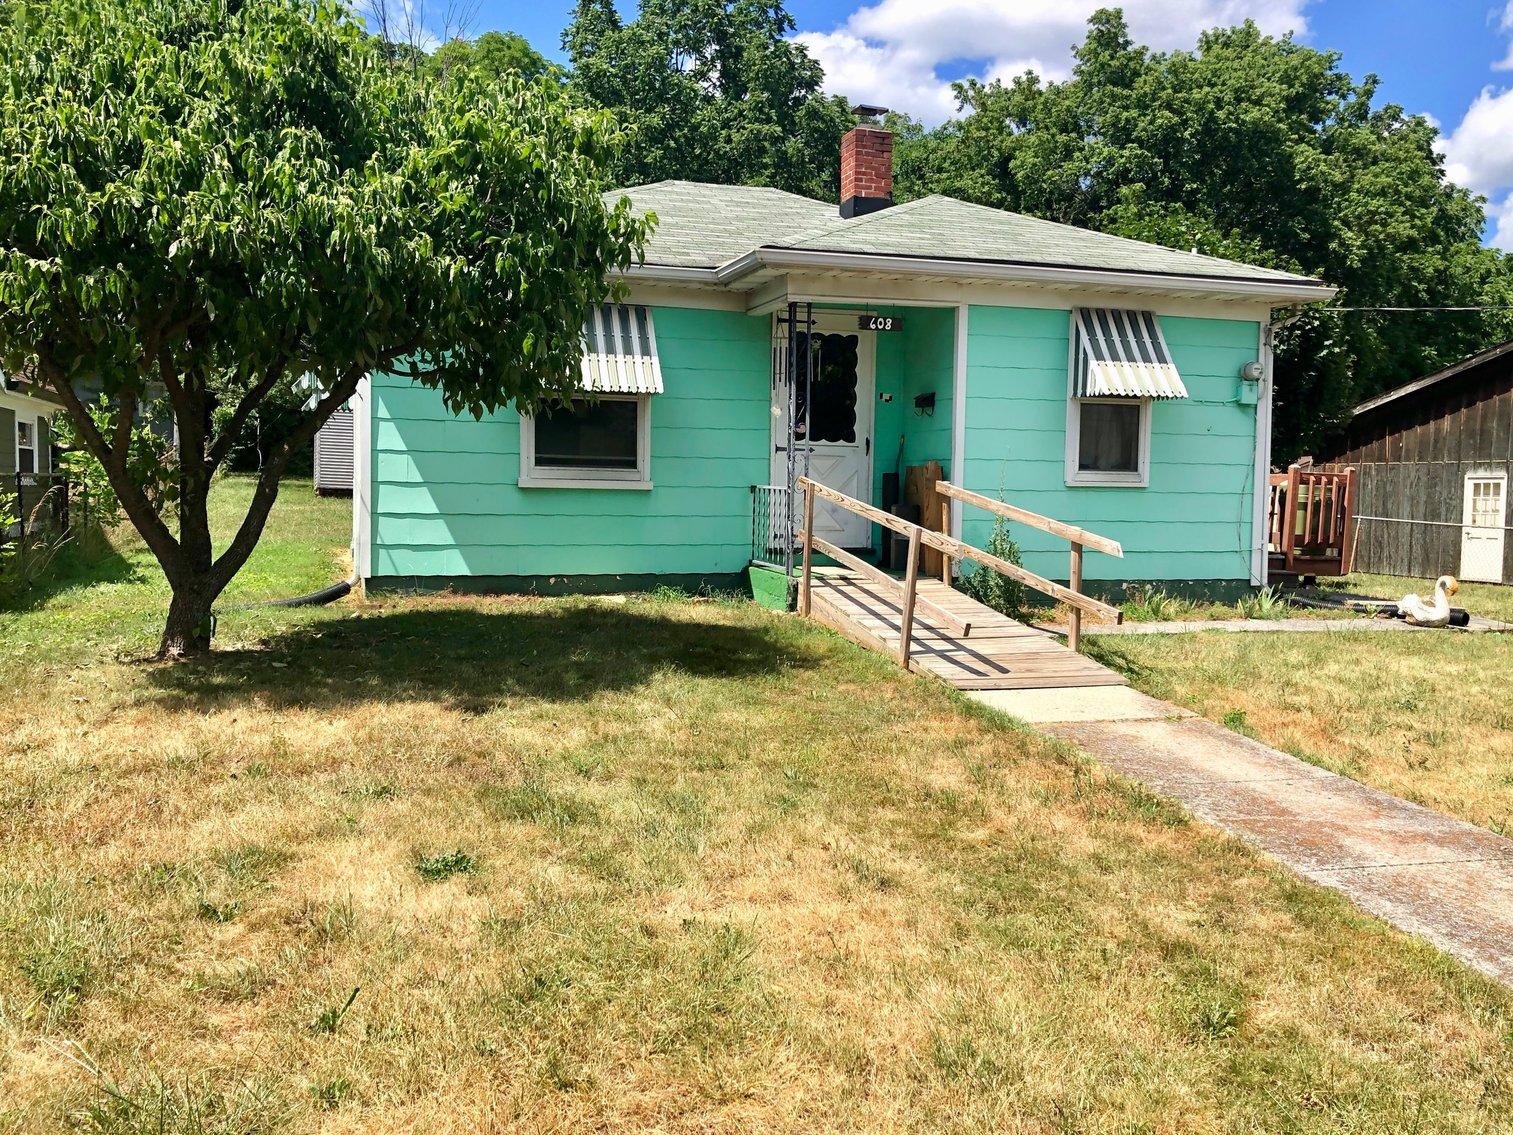 Image for 2 BR/1 BA Home in Harrisonburg, VA, Only 2 Miles From James Madison Univeristy--SELLS to the HIGHEST BIDDER!!